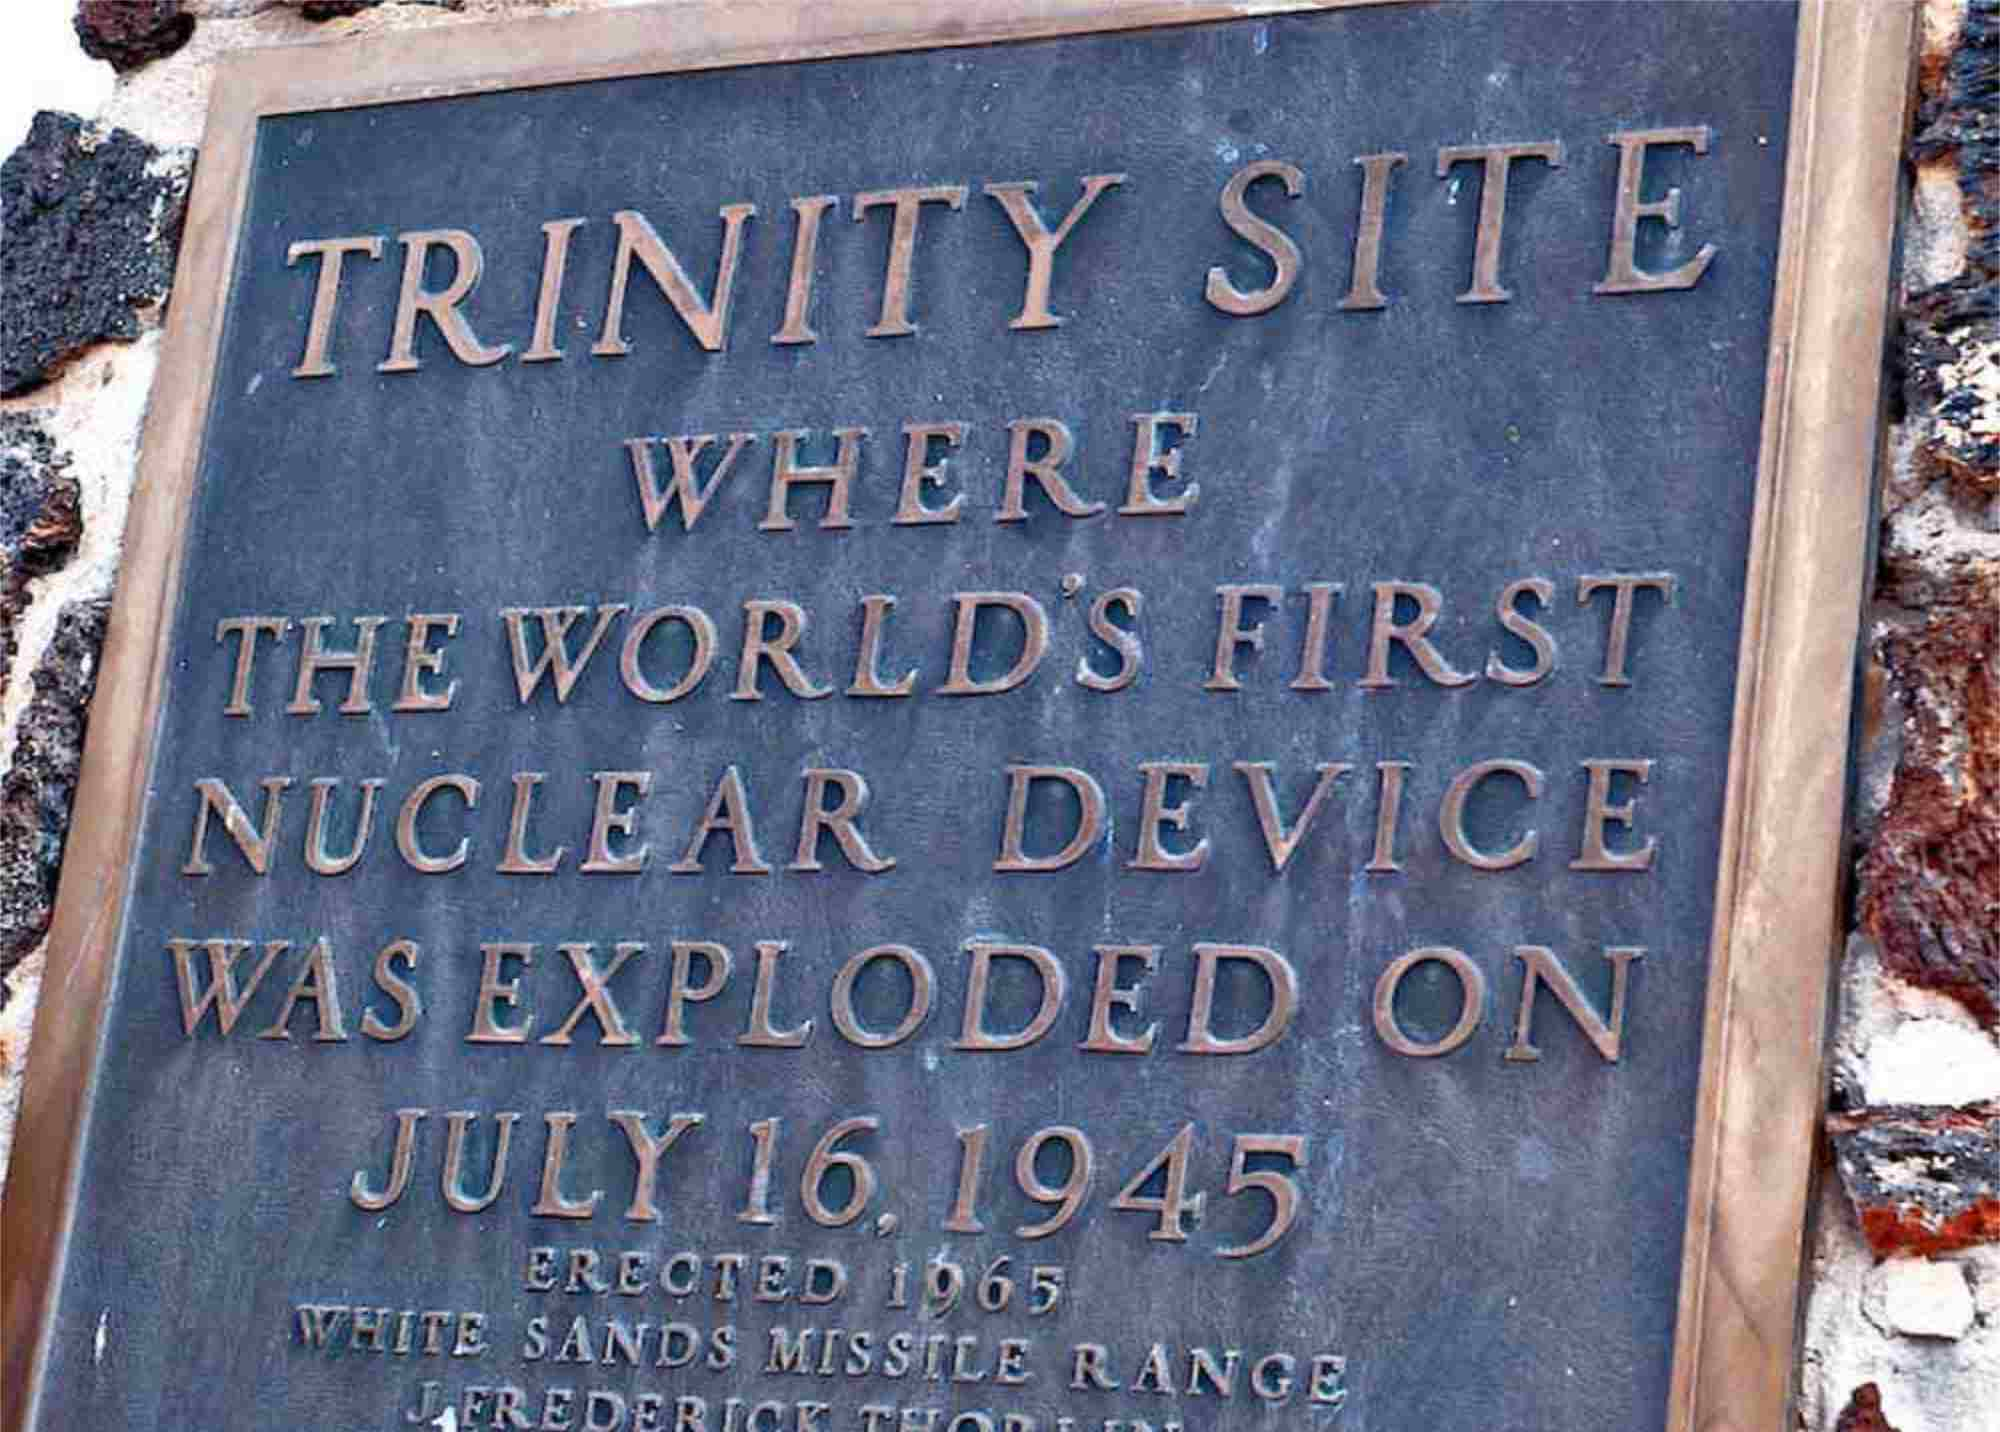 Trinity Site Tour October 5 2019 White Sands Missile Range